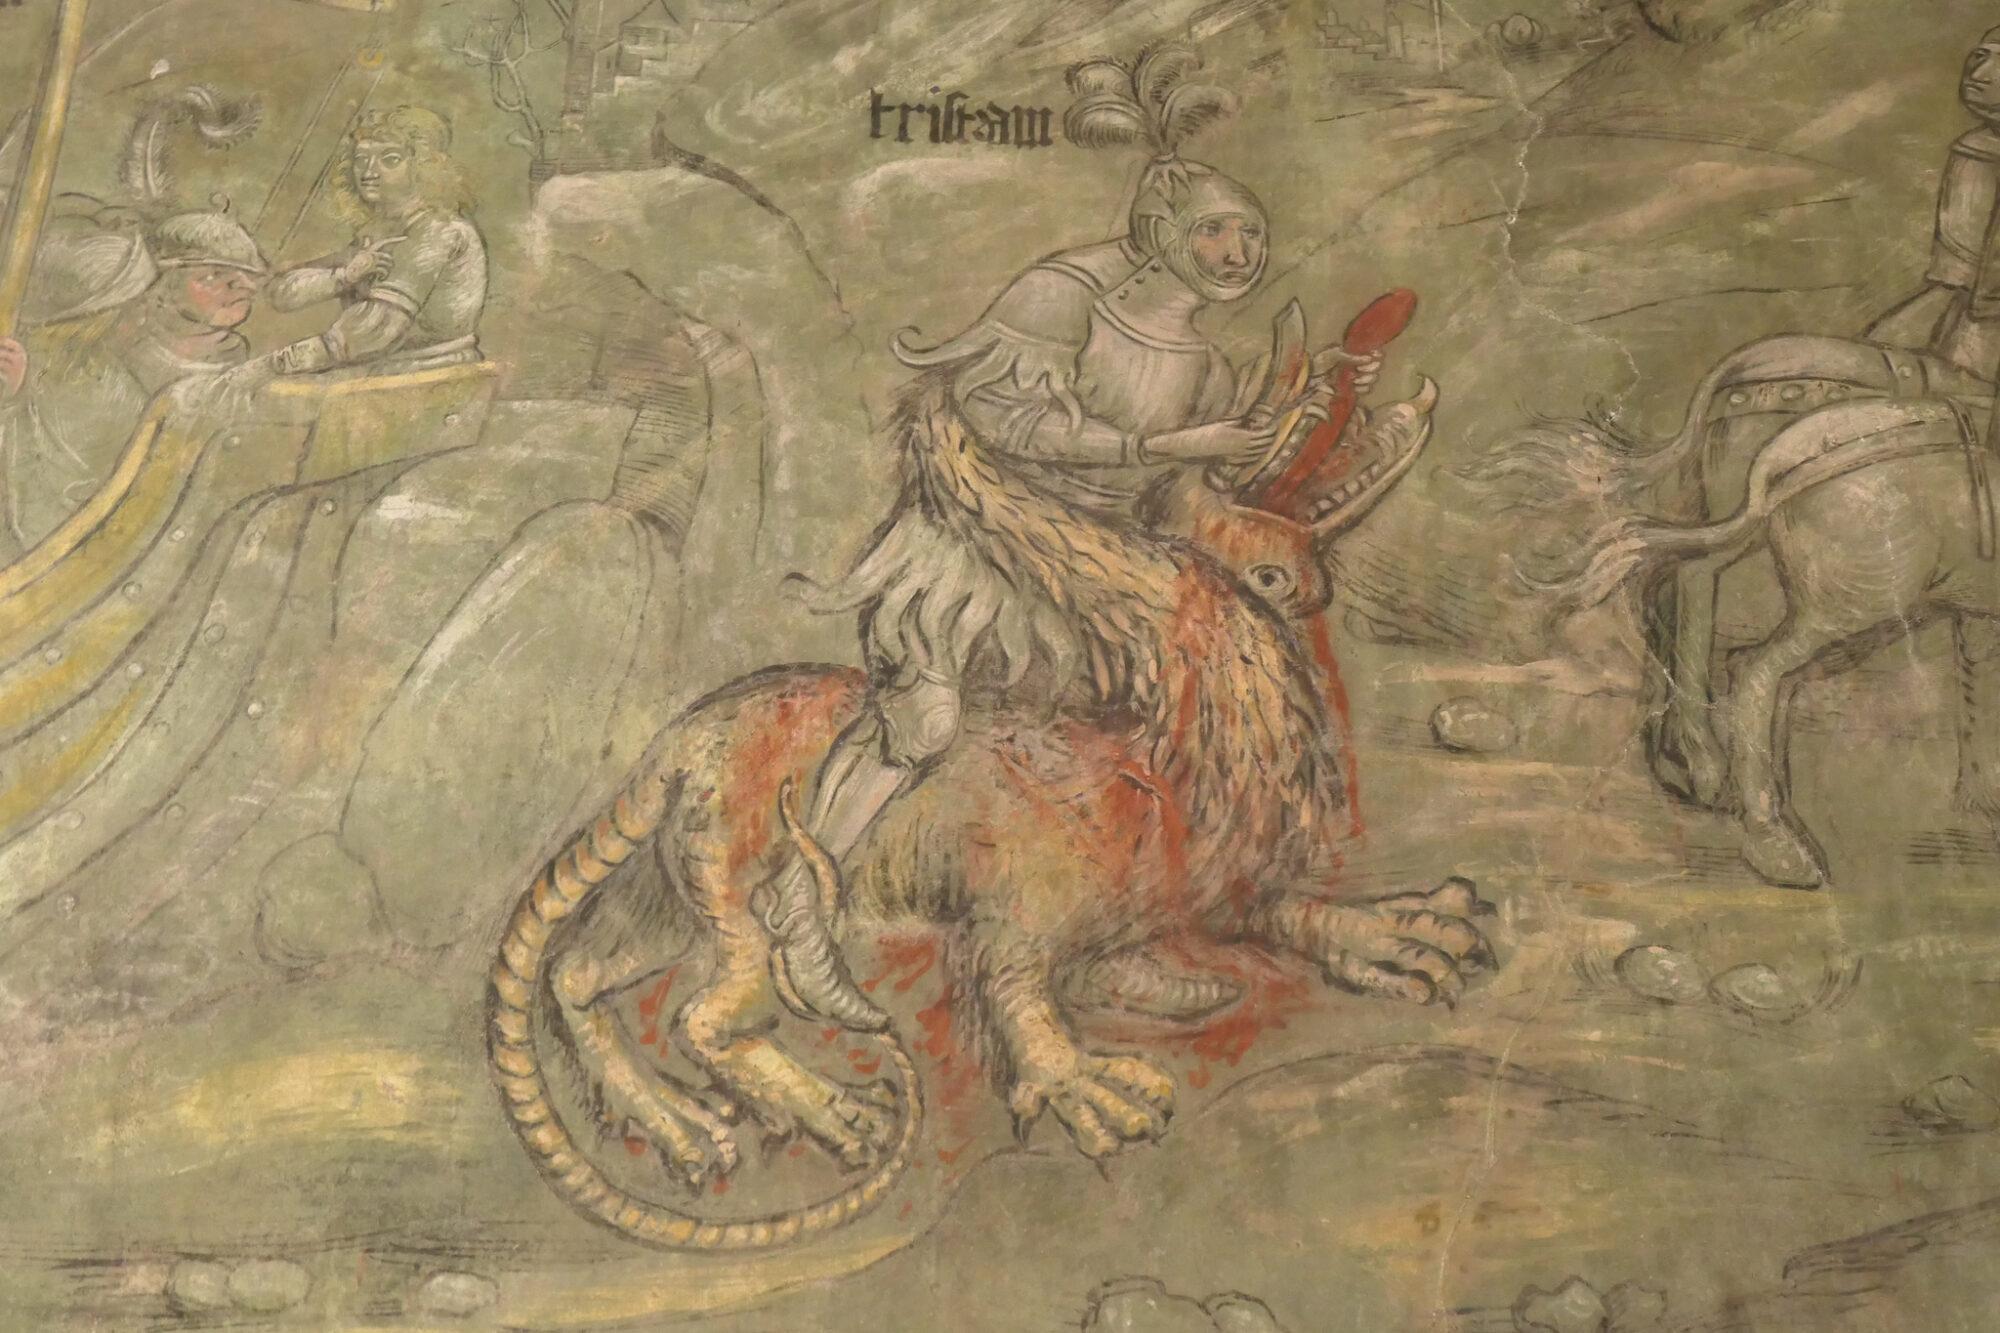 Fresco showing Tristan